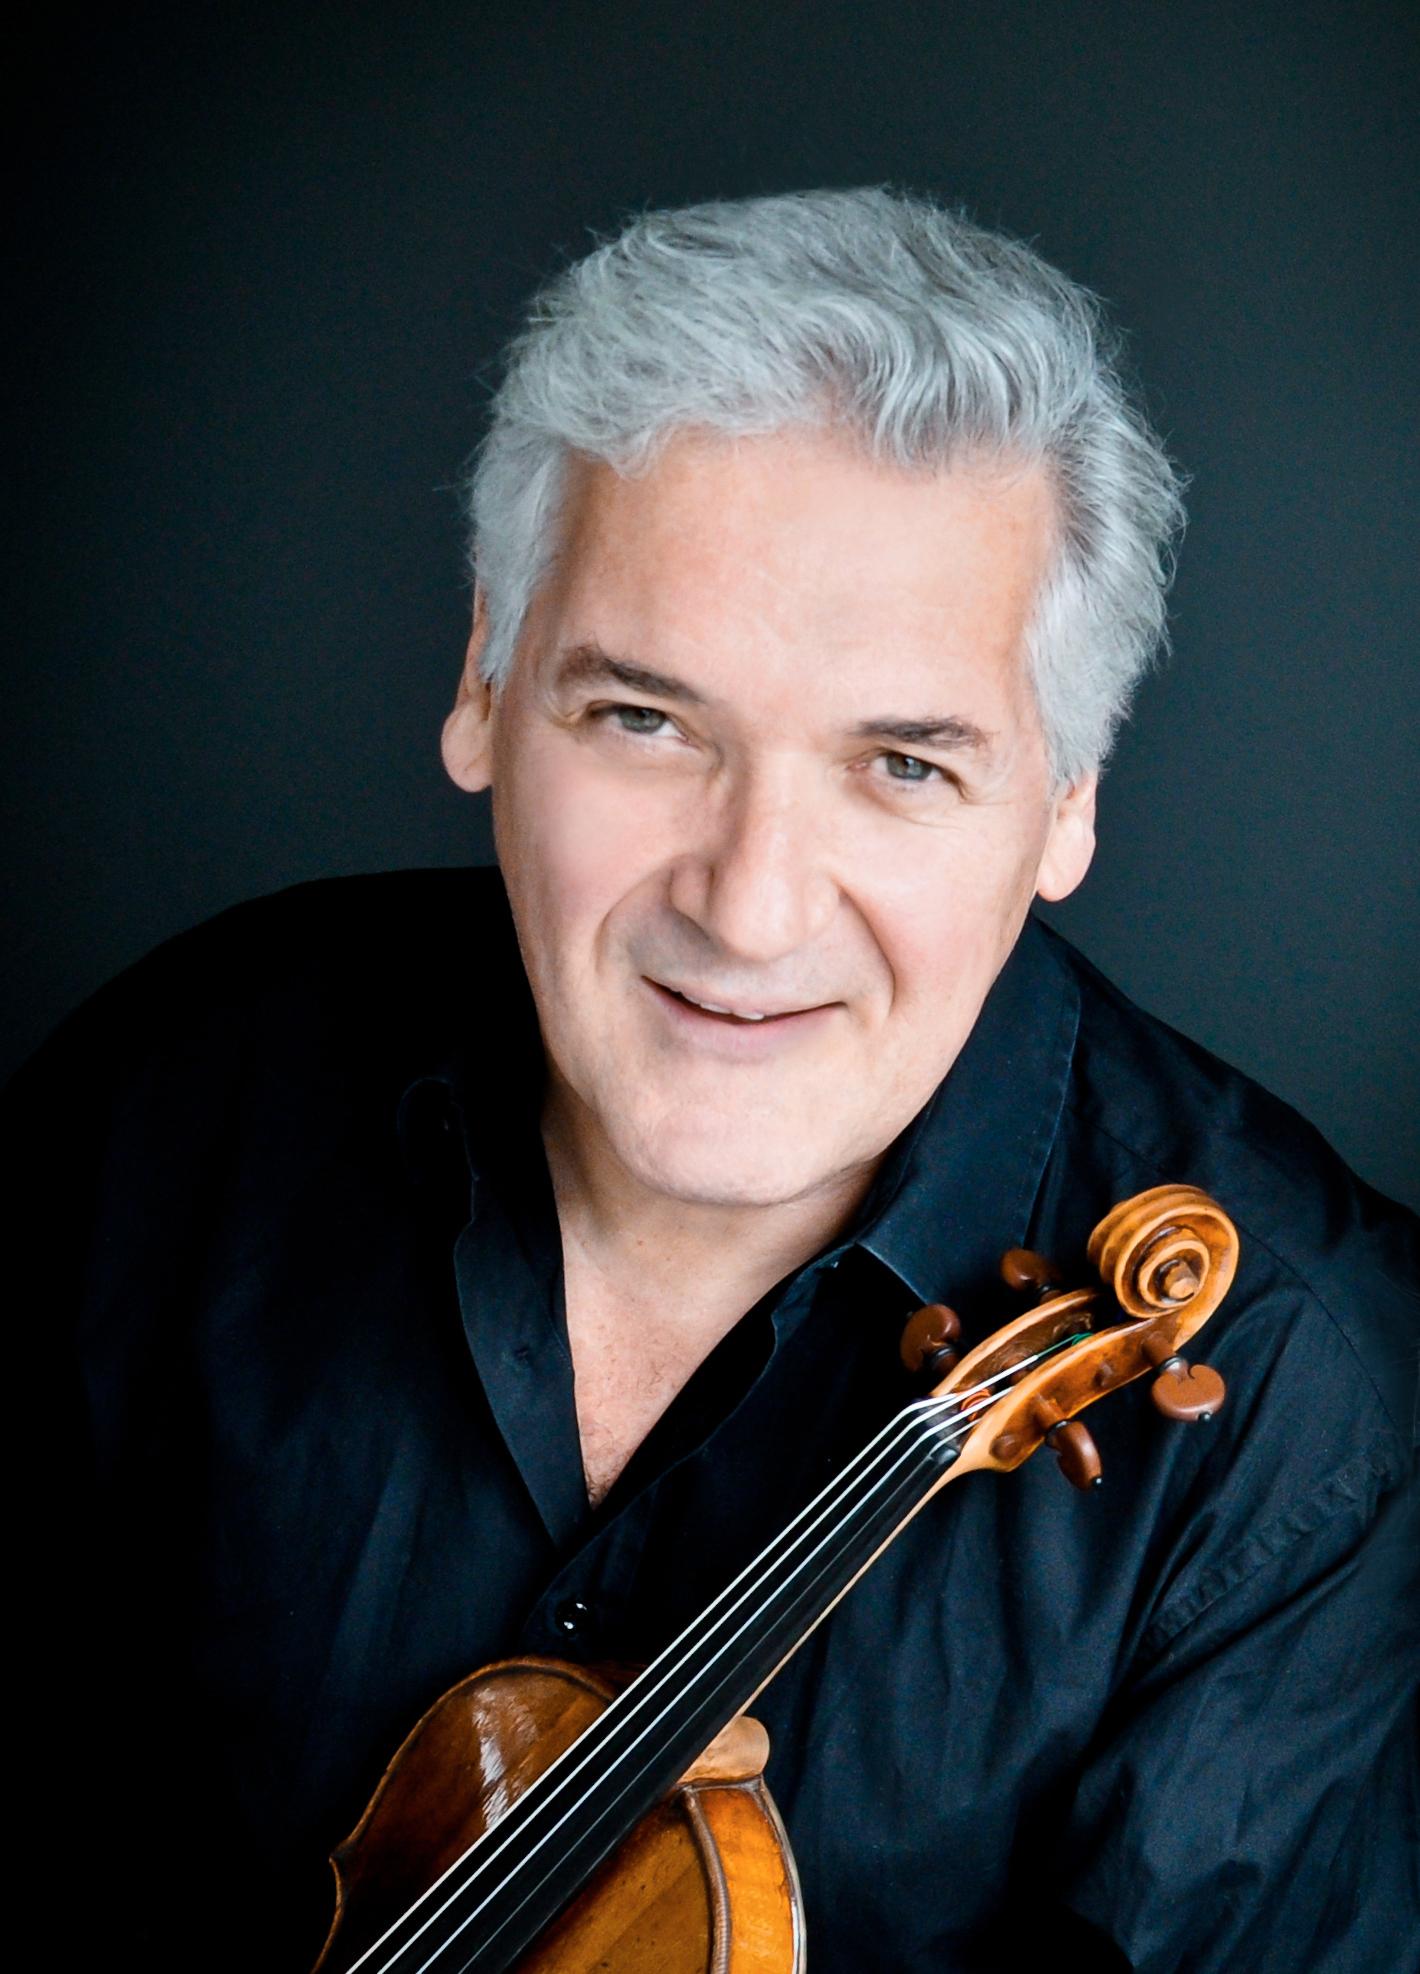 Orpheus Chamber Orchestra with Pinchas Zukerman